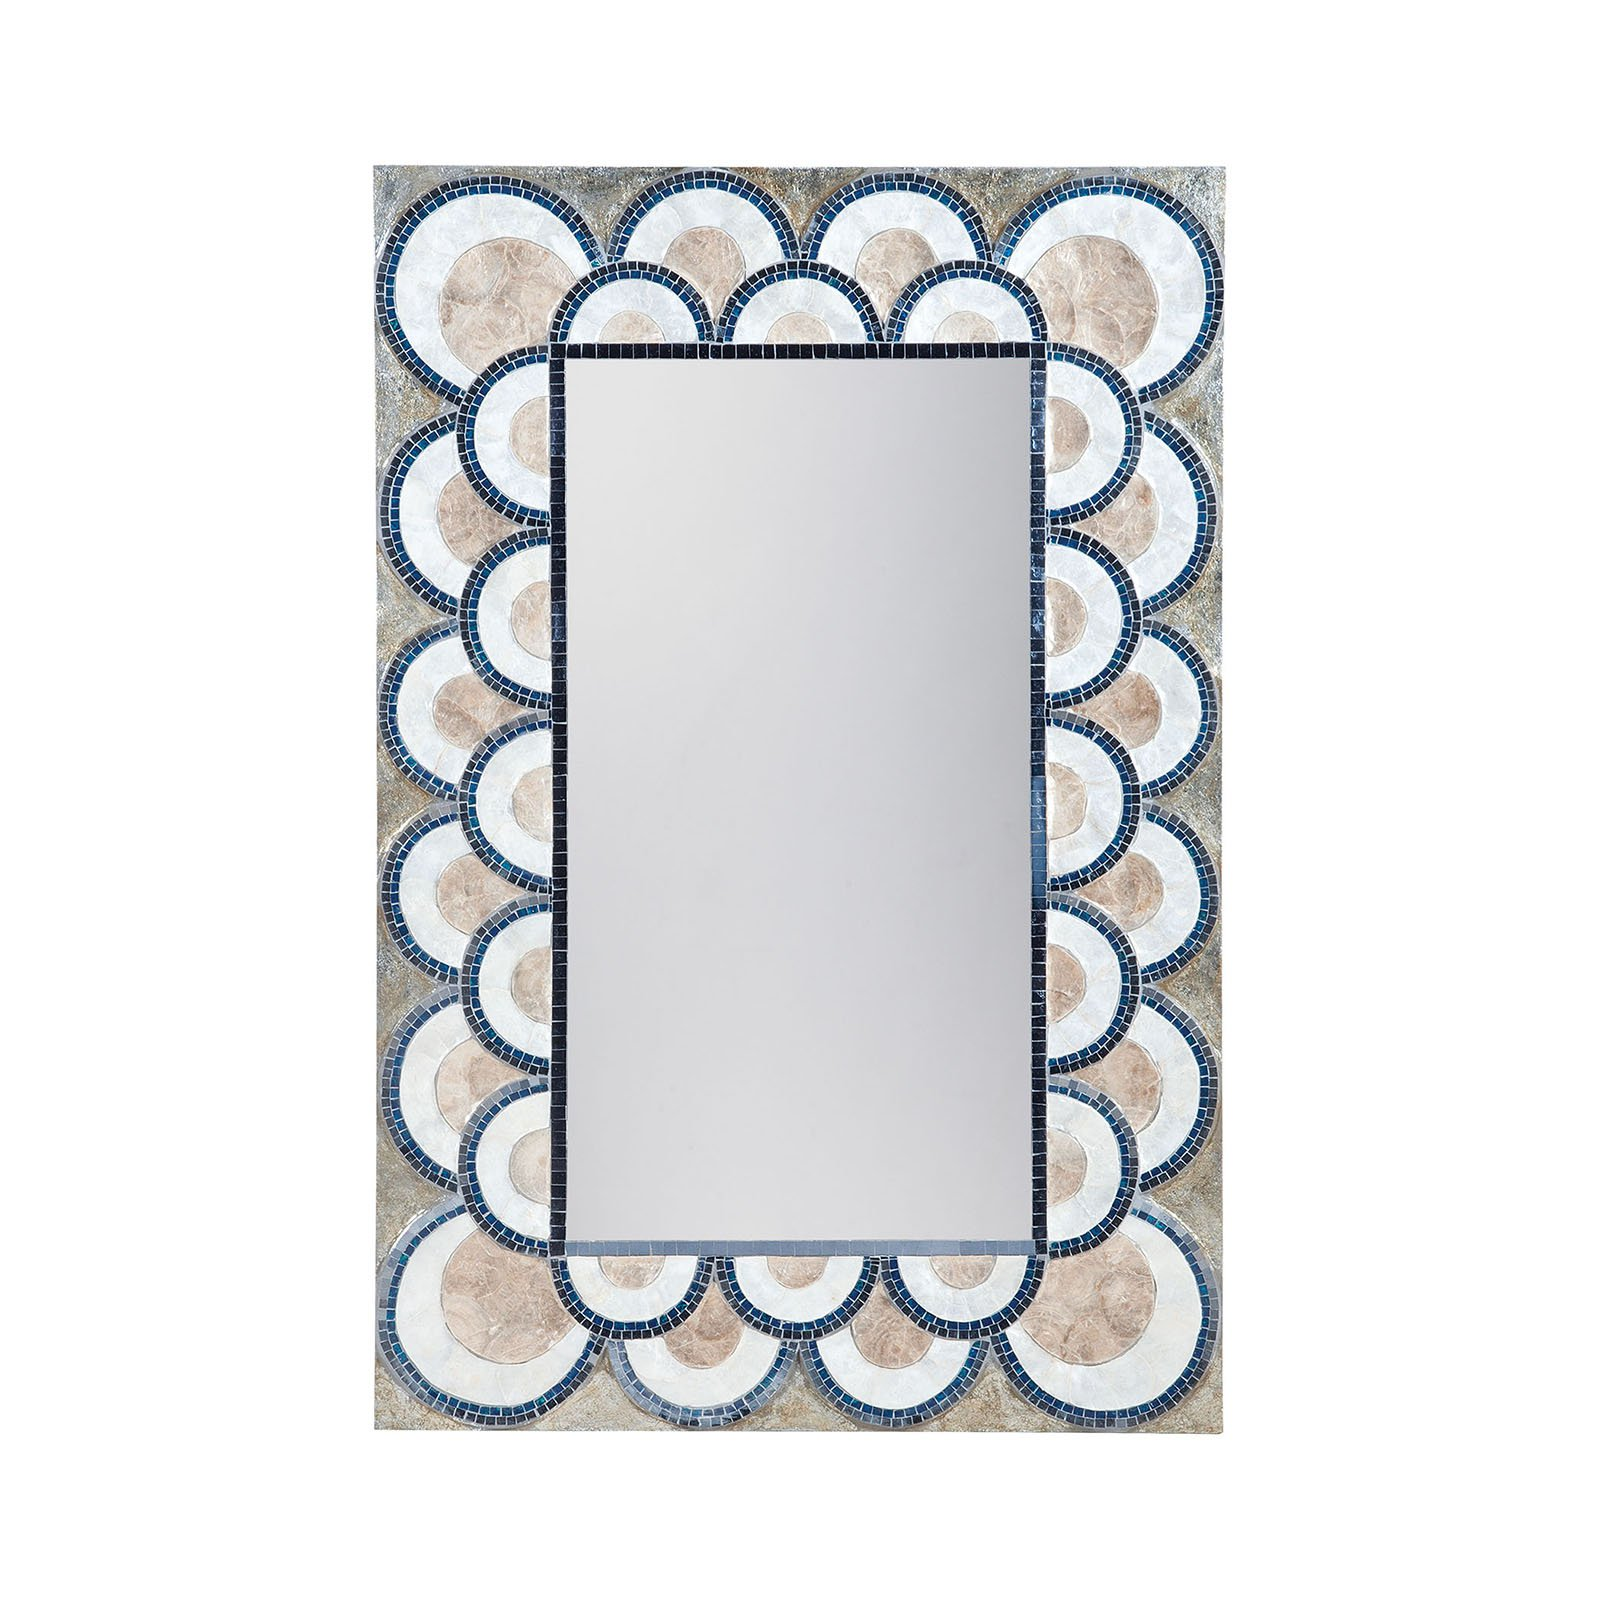 Dimond Home Art Deco Capiz Shell Mosaic Wall Mirror - 31.5W x 47.3